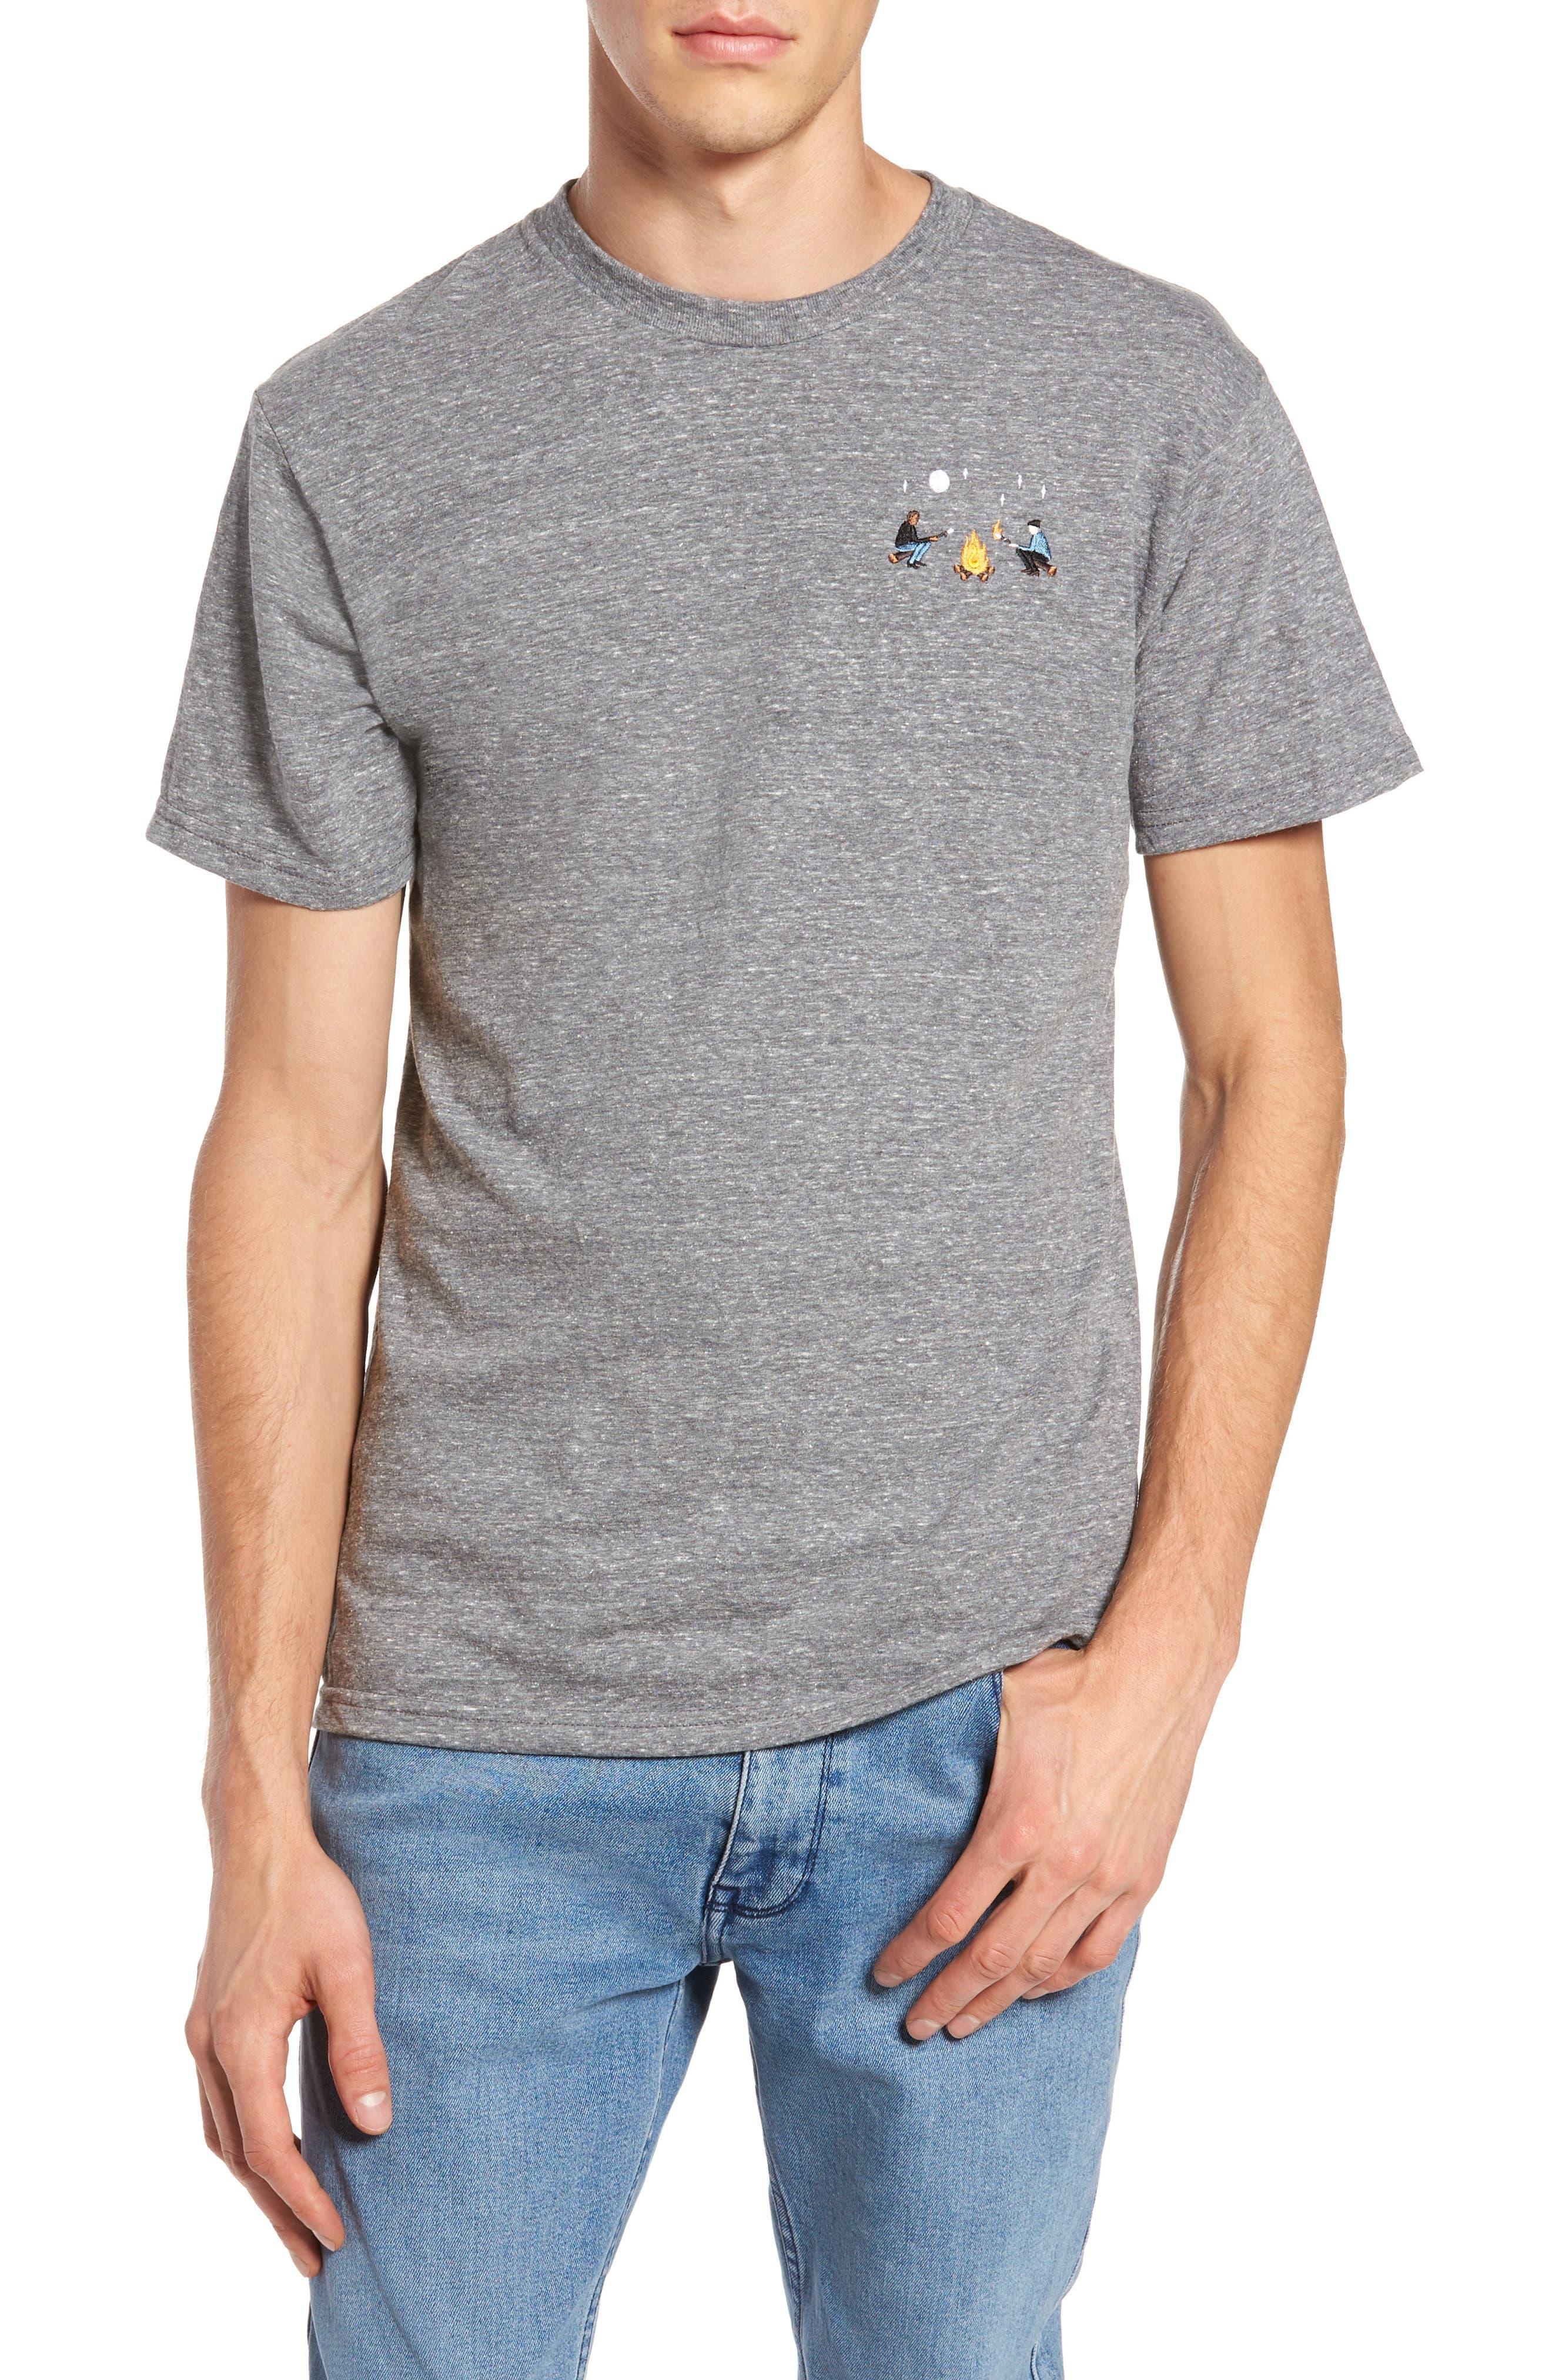 Burning Marshmallows T-Shirt,                             Main thumbnail 1, color,                             Triblend Grey